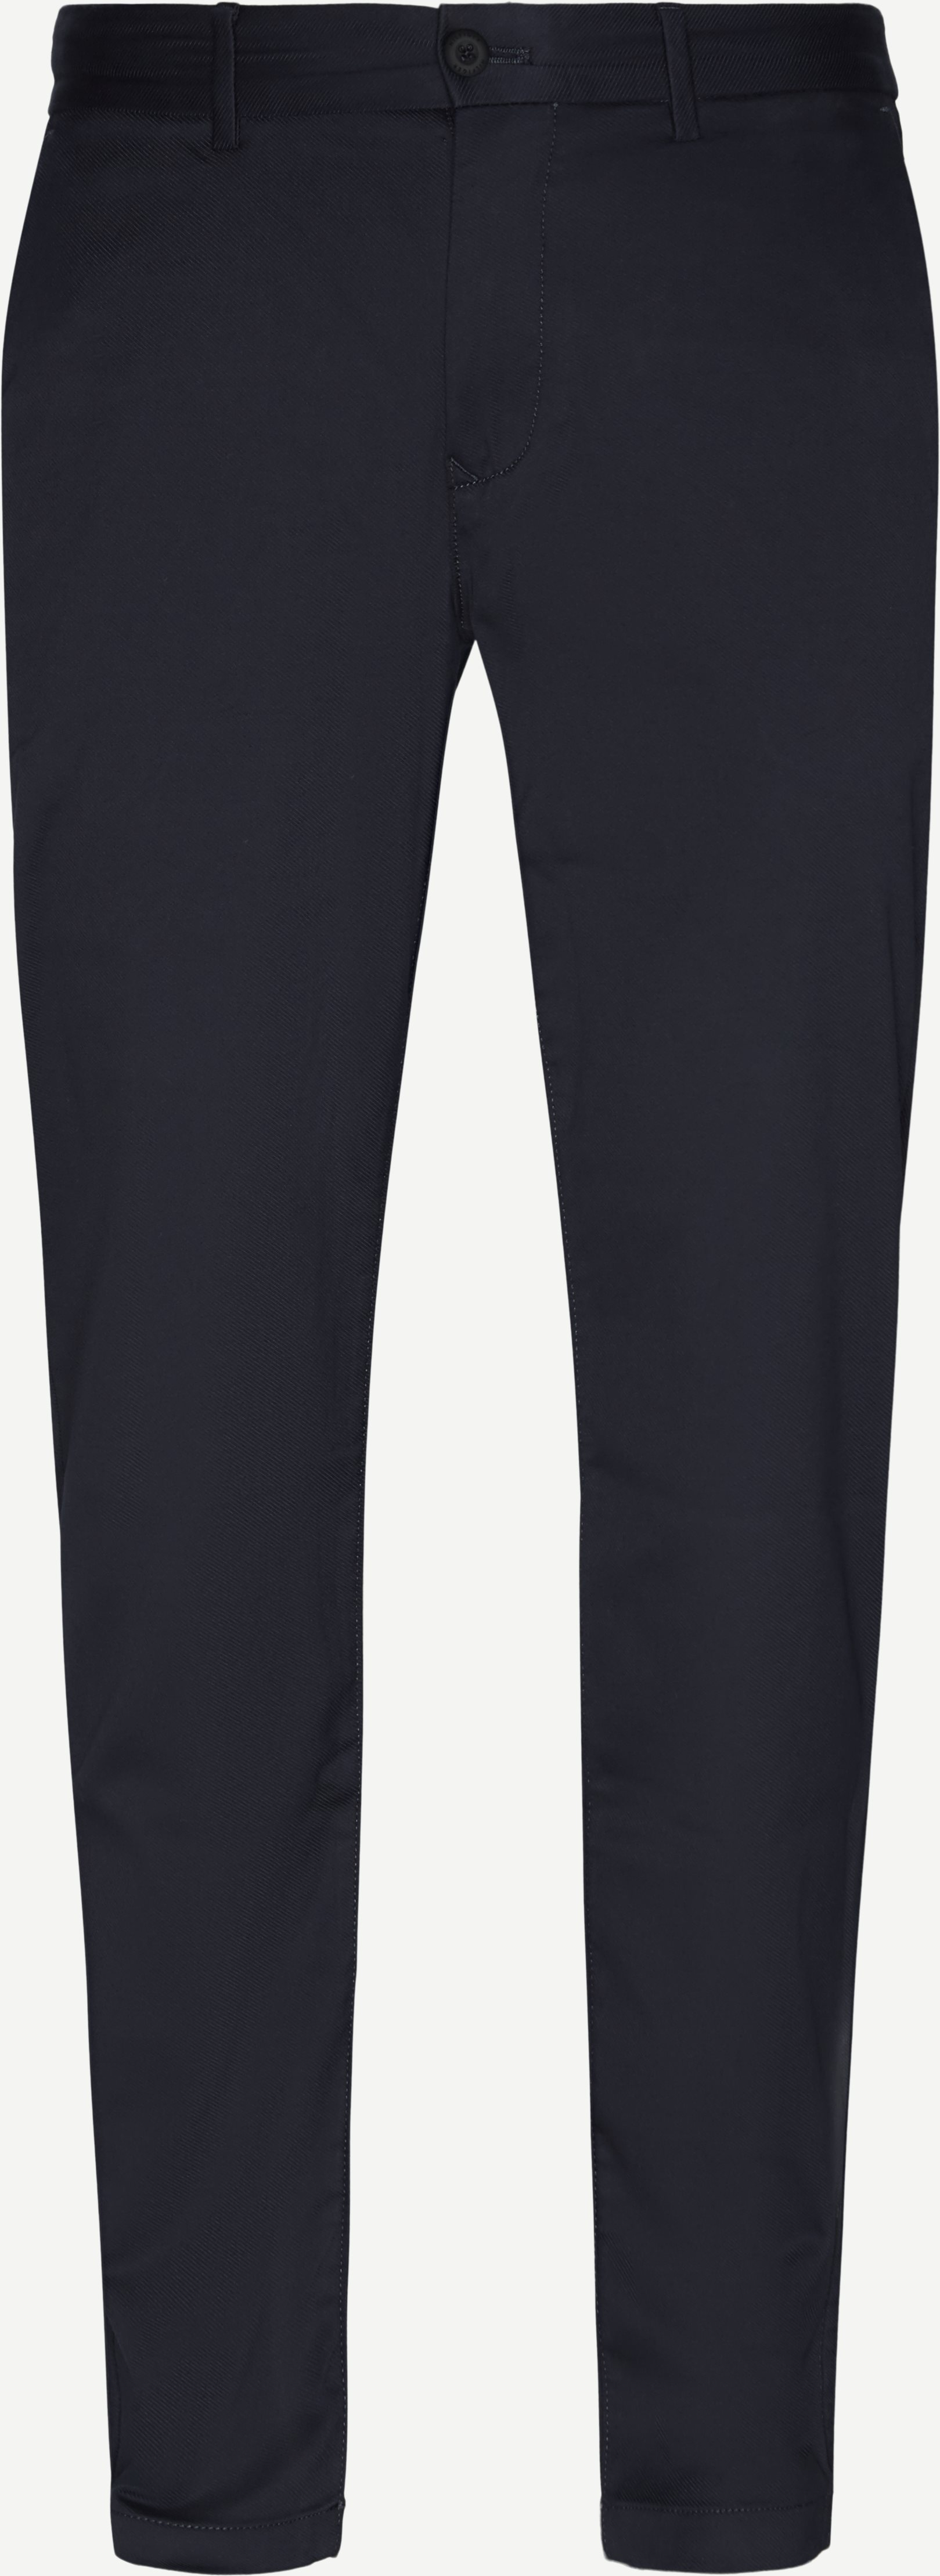 Hosen - Tapered fit - Blau